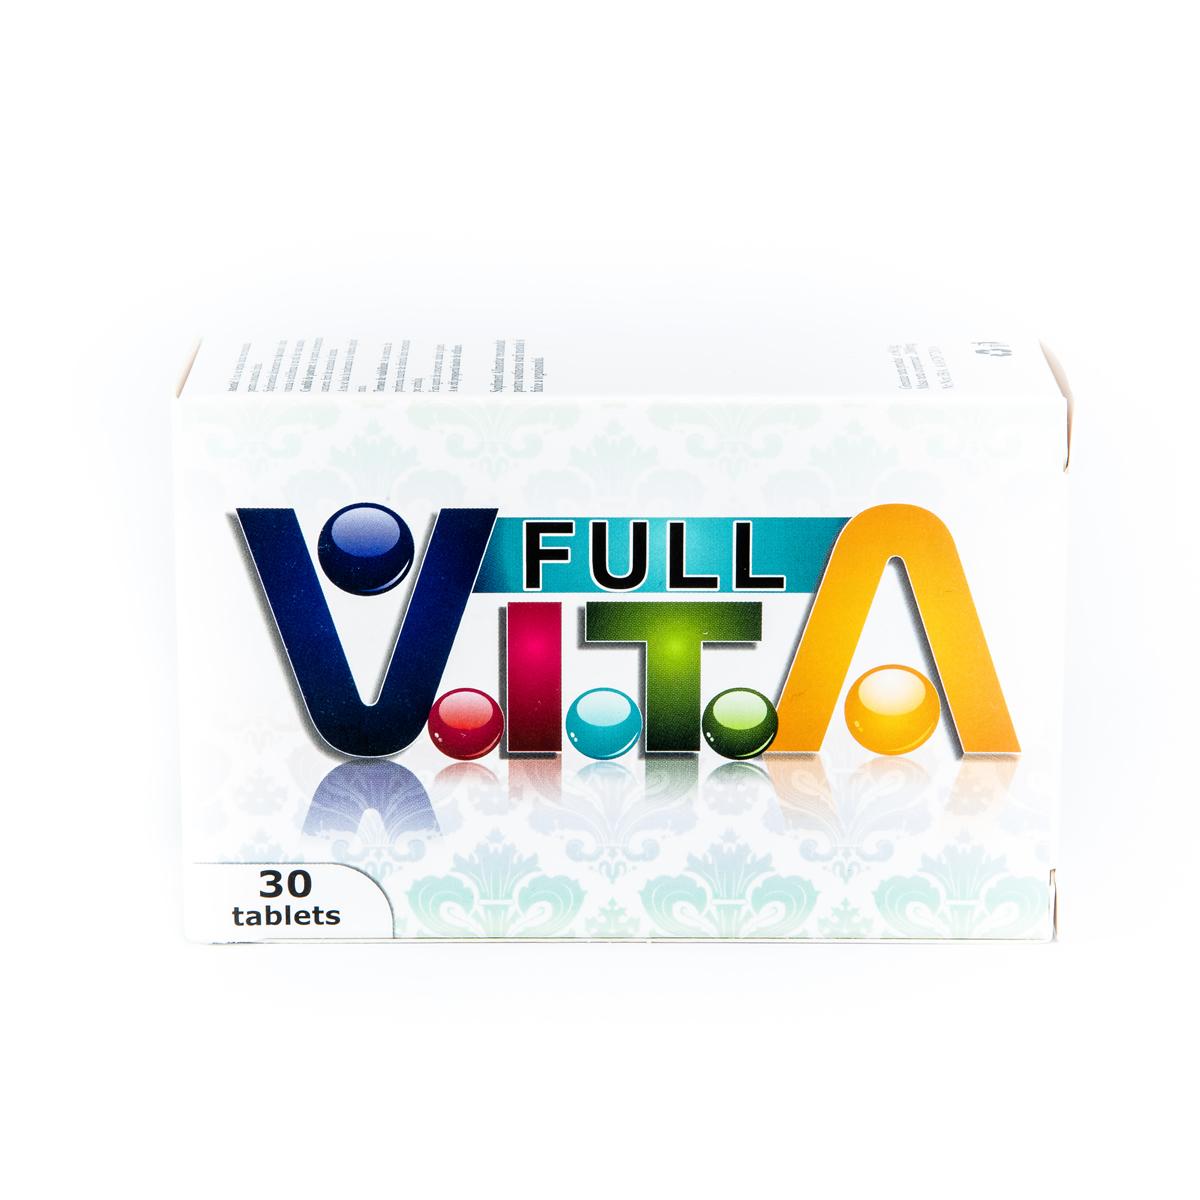 VM17_vitafull